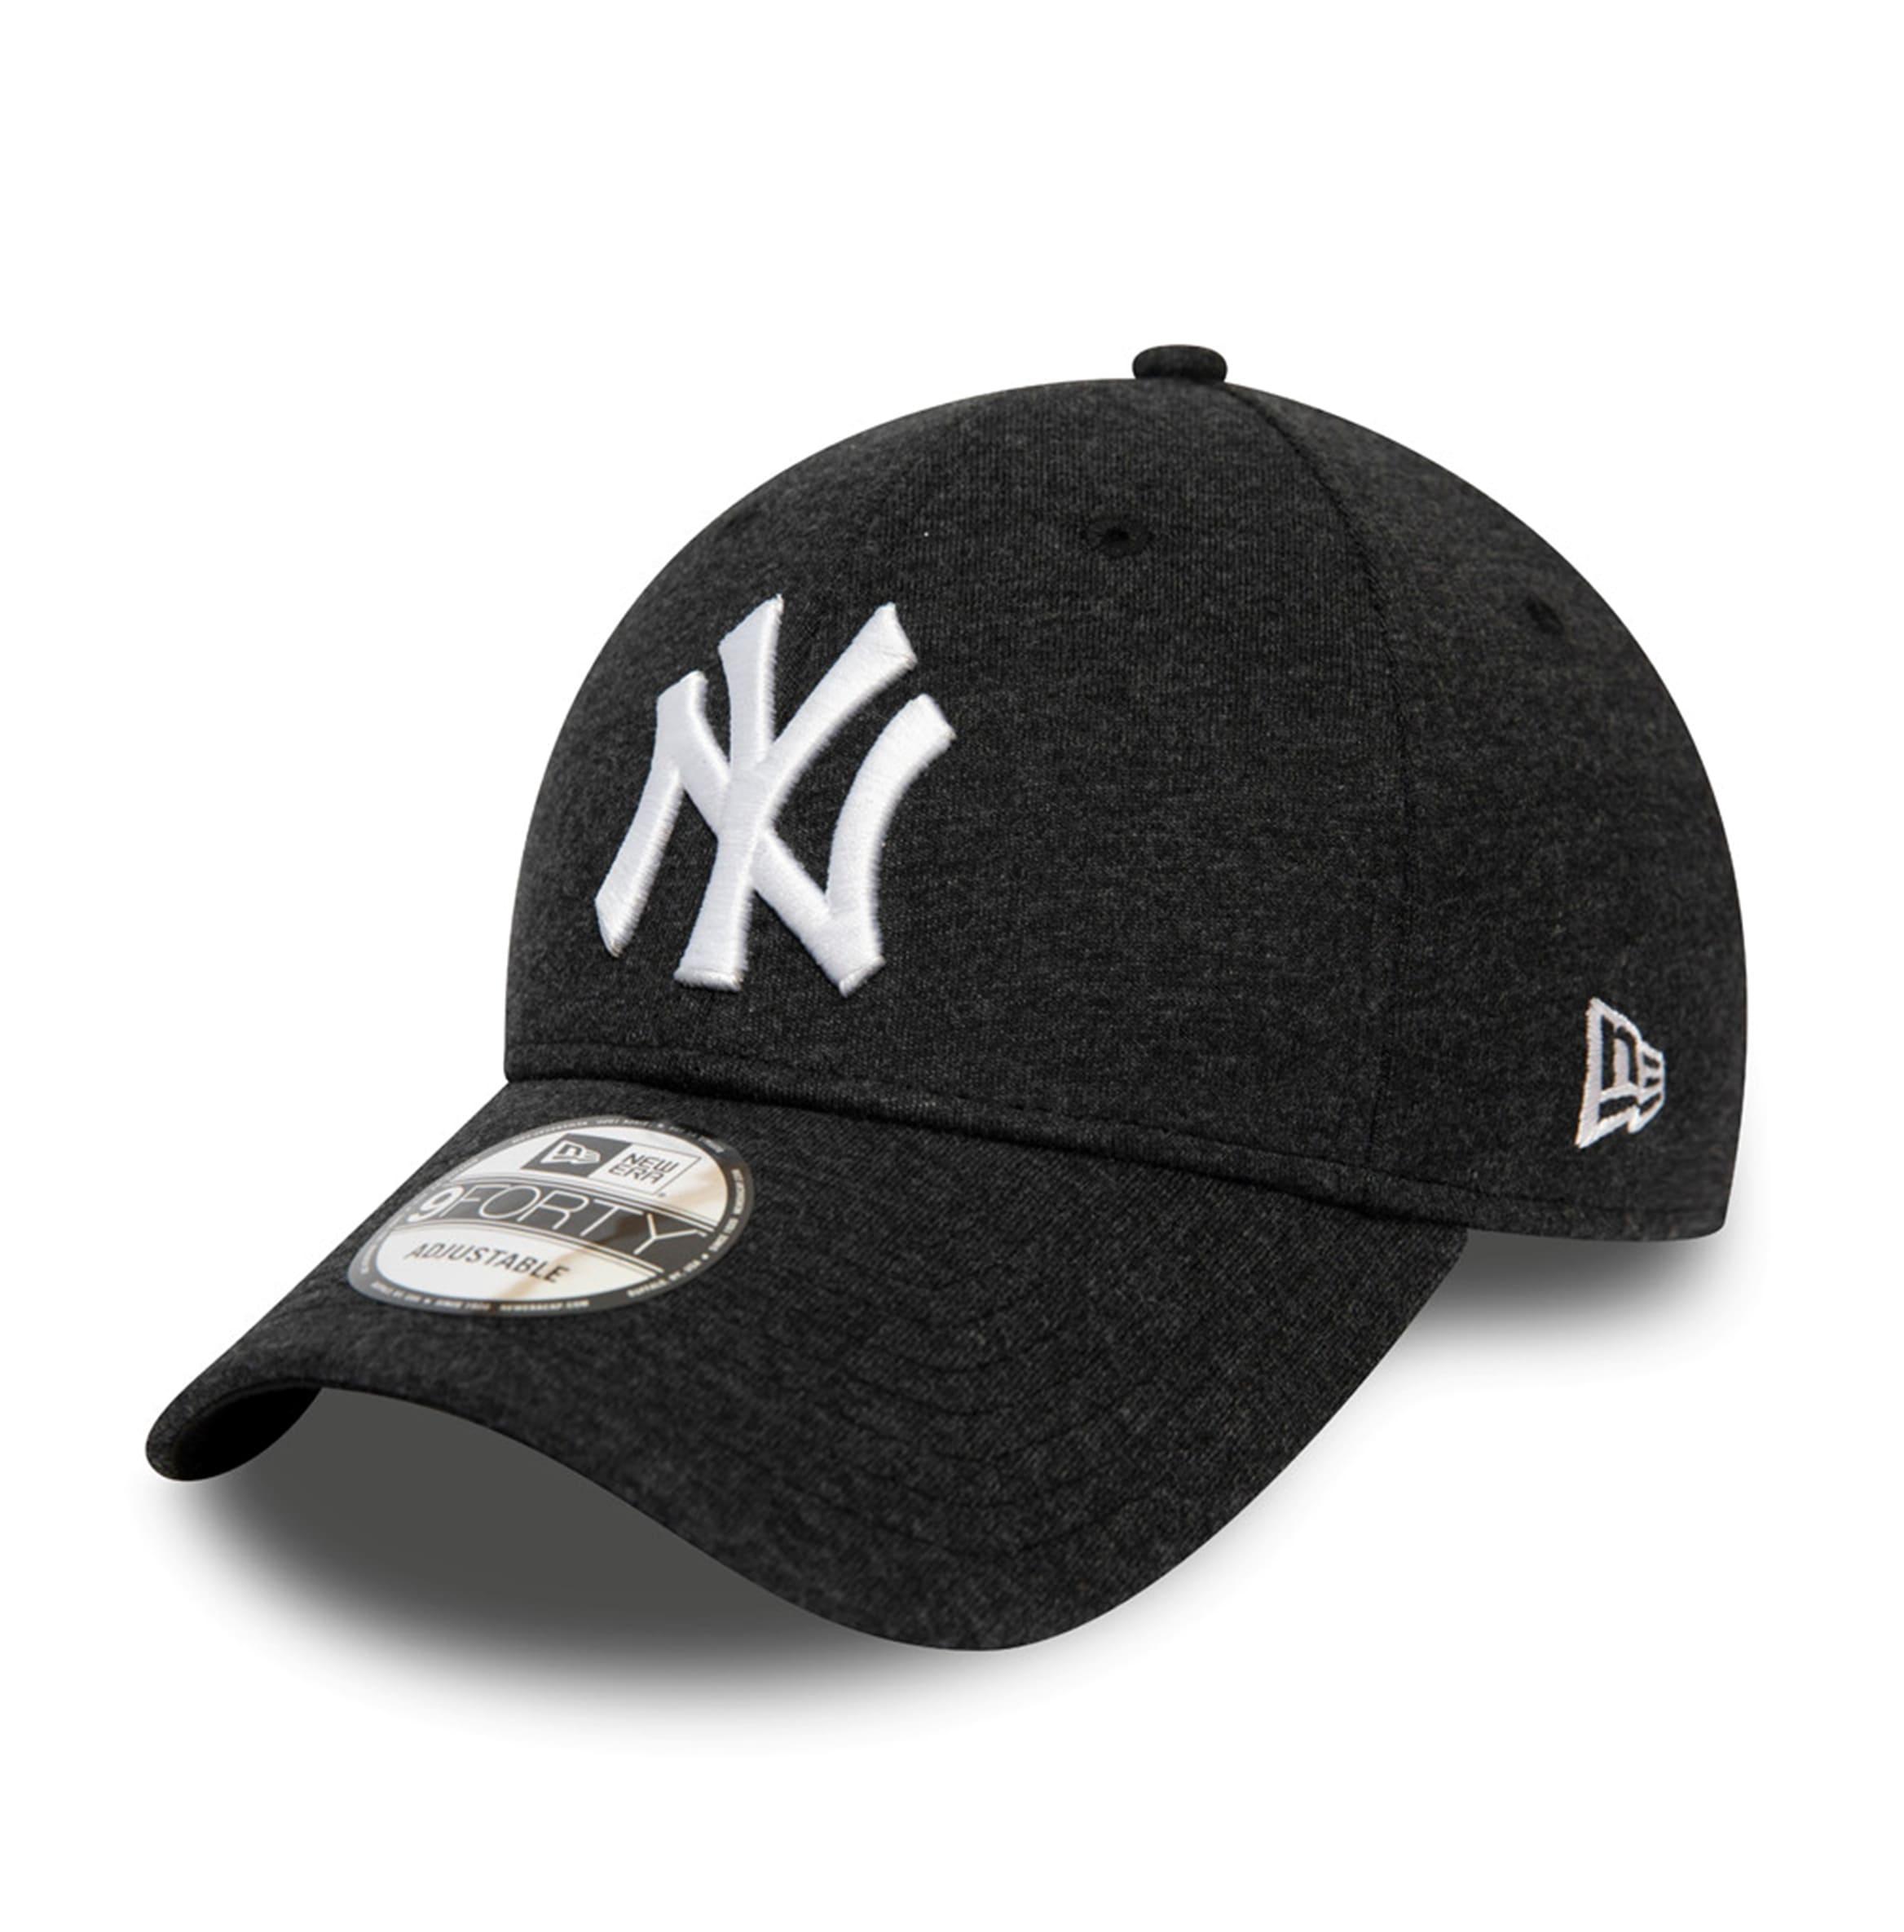 https://www.leadermode.com/195501/new-era-cap-jersey-essential-9forty-n-12490480-blk-whi.jpg